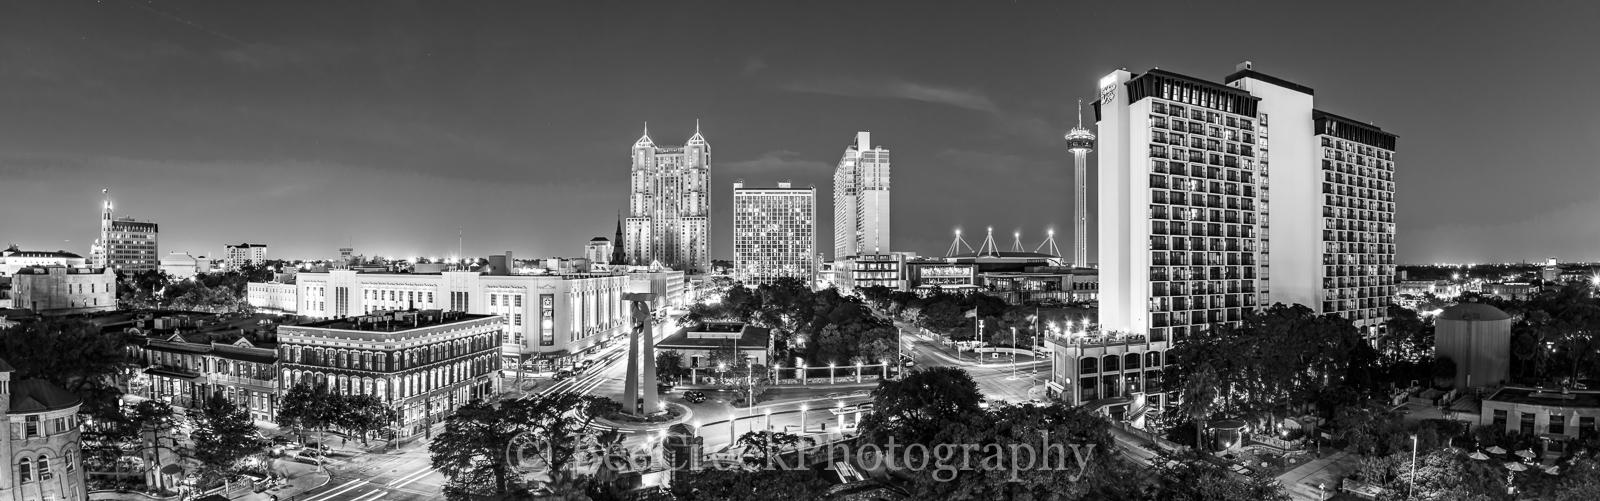 Grand Hyatt, Hilton, Marriott, Riverwalk, San Antonio, Tod Grubbs, Torch or Friendship, Tower of Americas, beecreekphotography, black and white, city, cityscape, cityscapes, destination, downtown, nig, photo